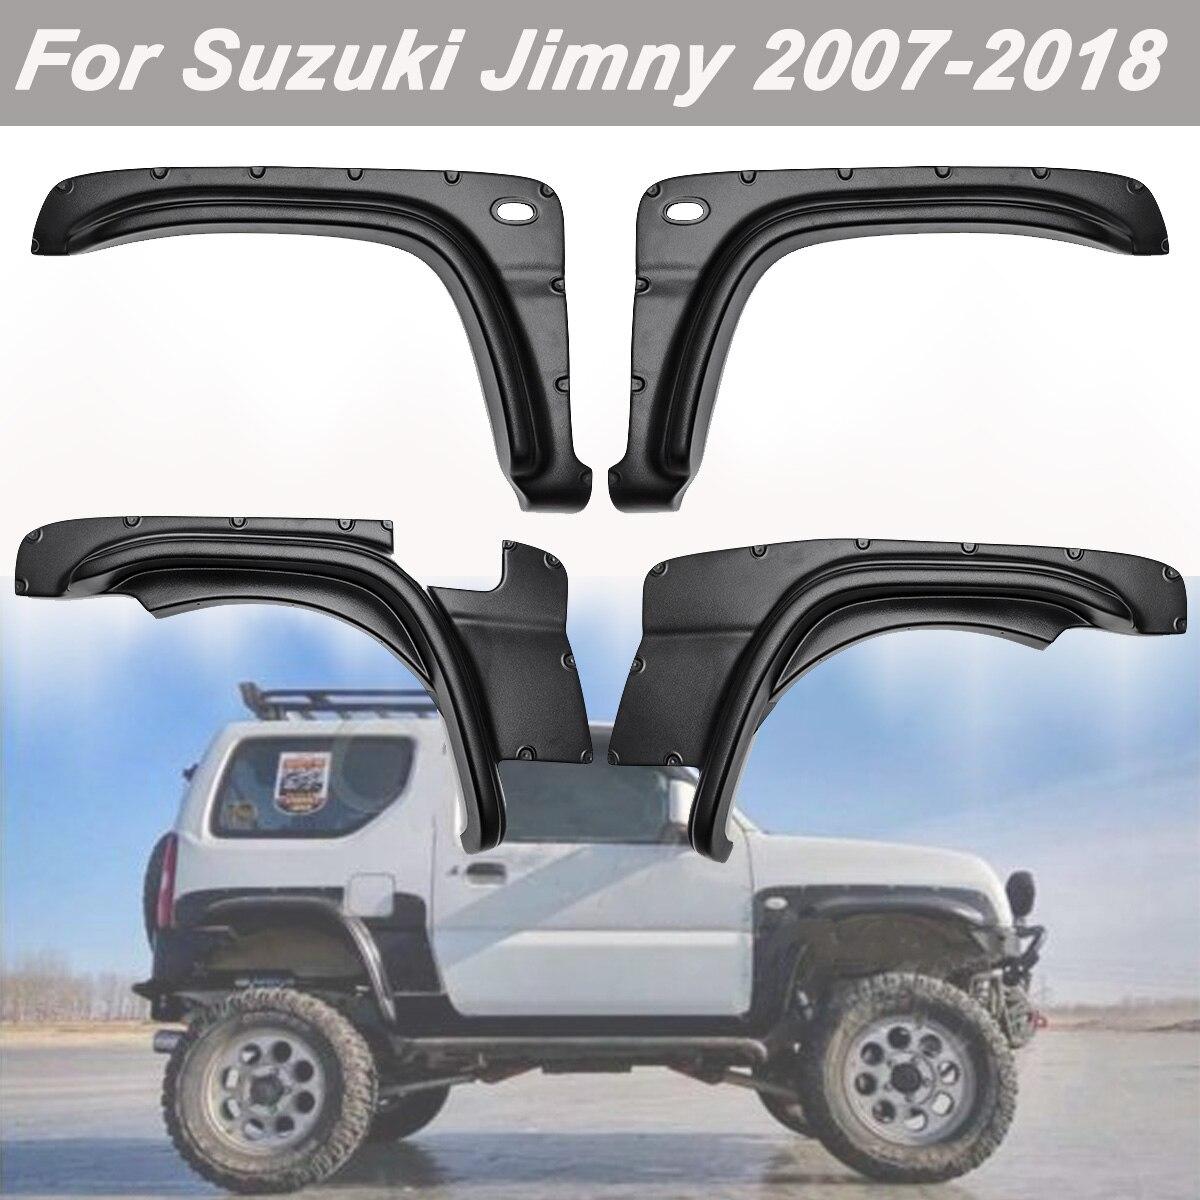 4Pcs Car Wheel Eyebrow Round Arc Fender Mud Flaps Mudguards Splash Guards For Suzuki jimny 2007-2017